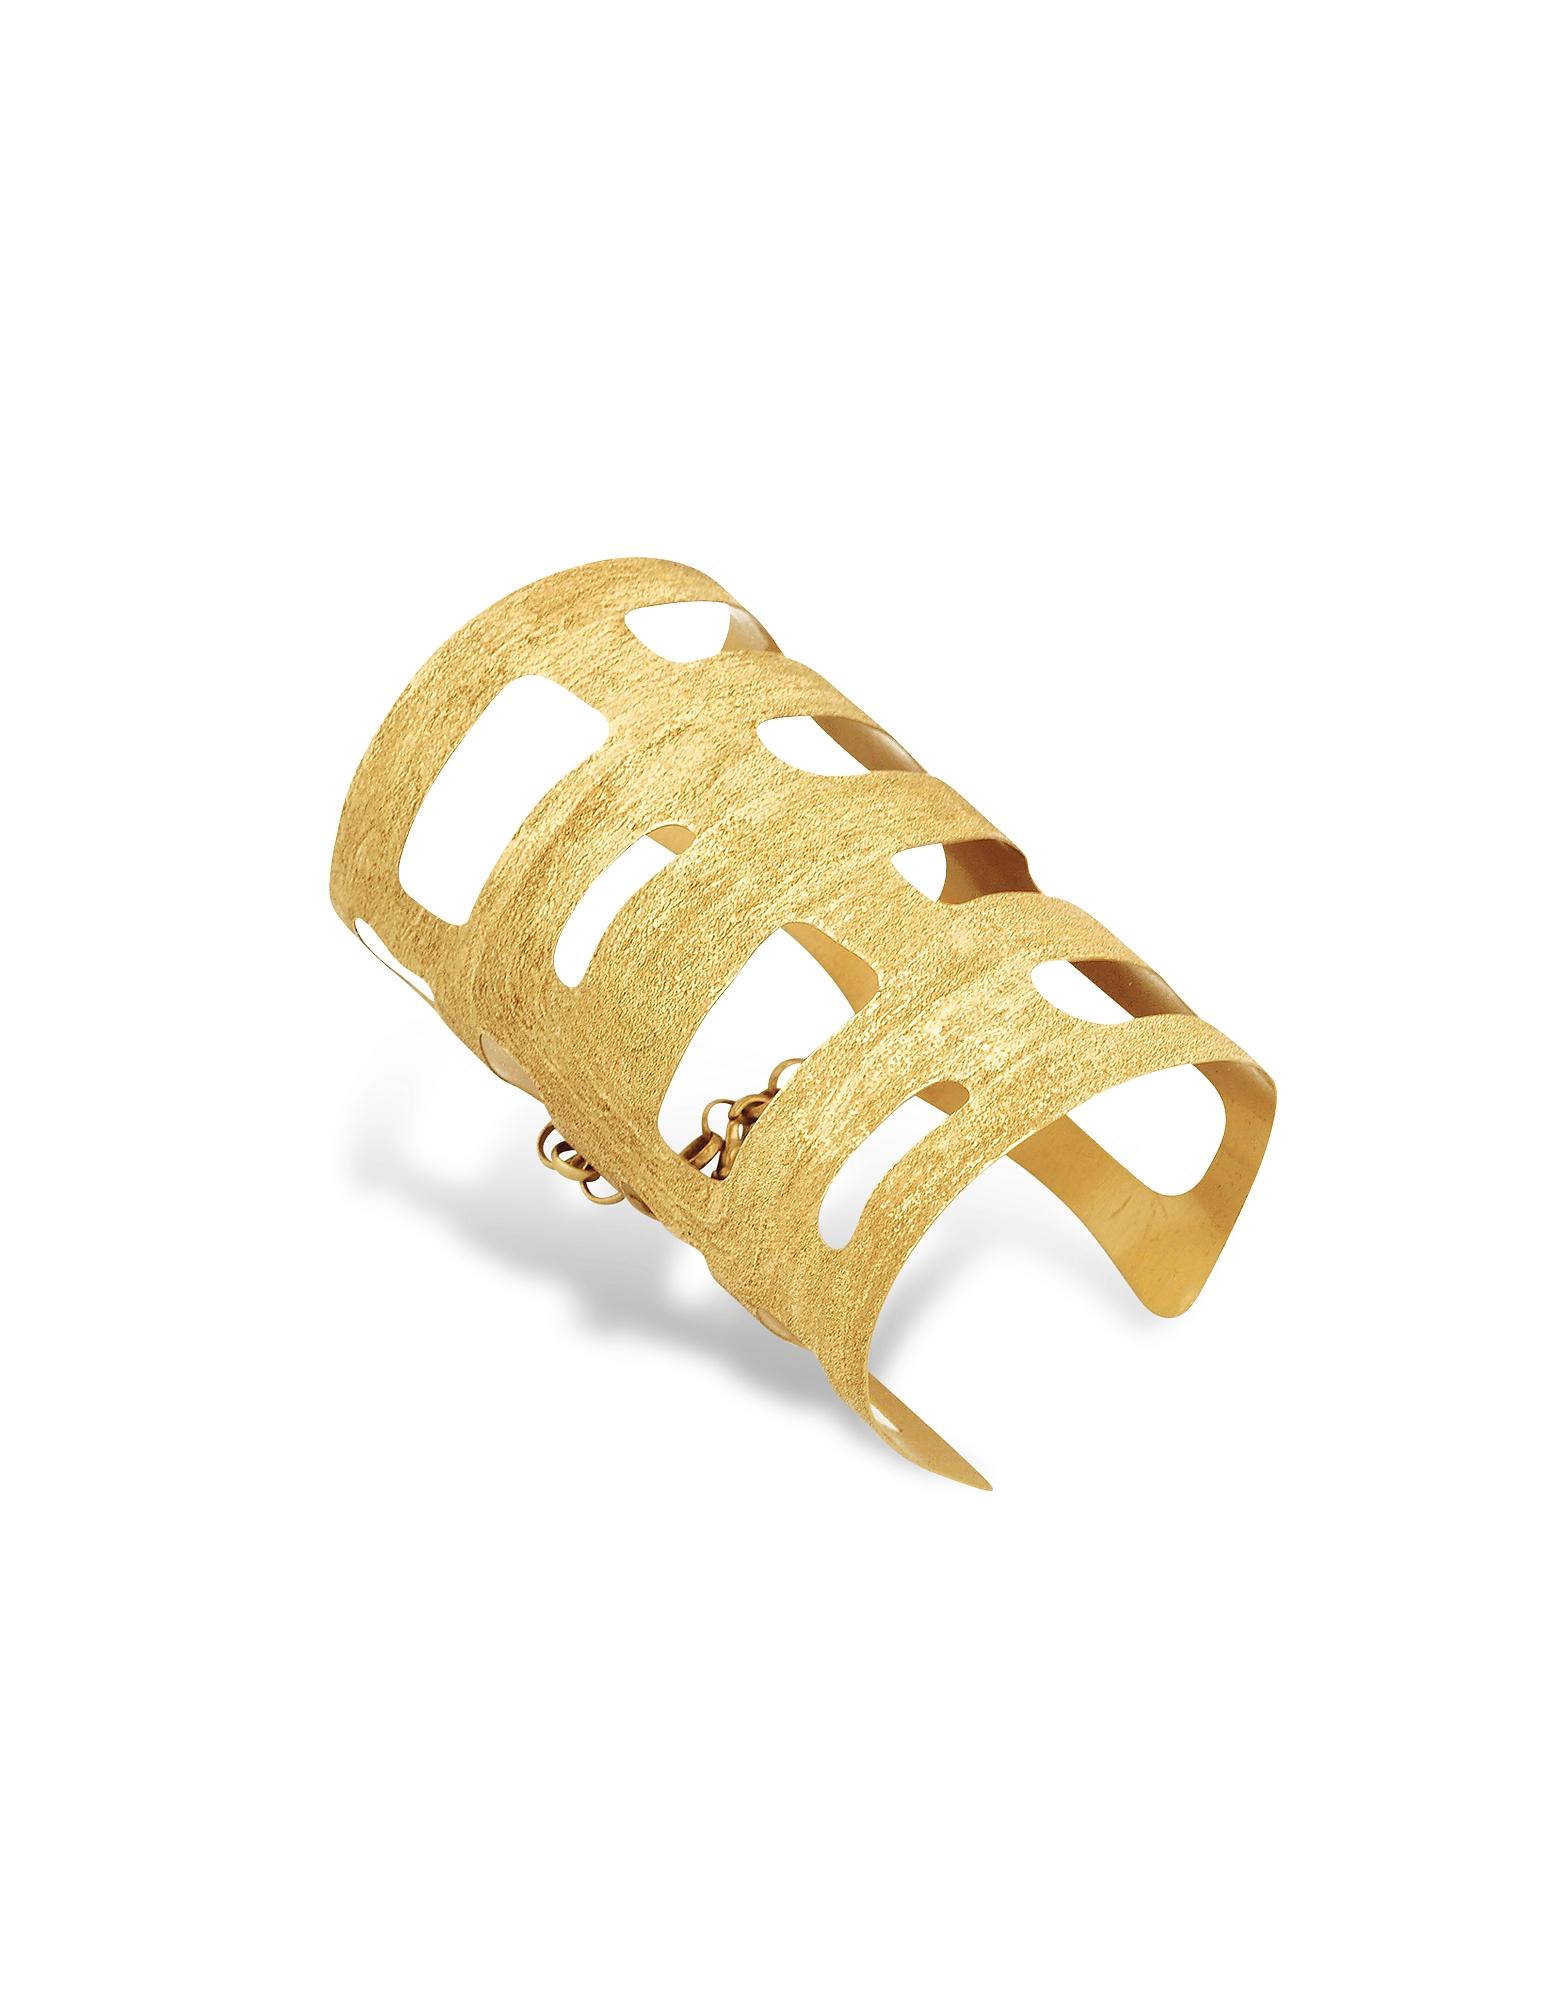 Stefano Patriarchi Bracelets, Golden Silver Etched Cut Out Medium Cuff Bracelet